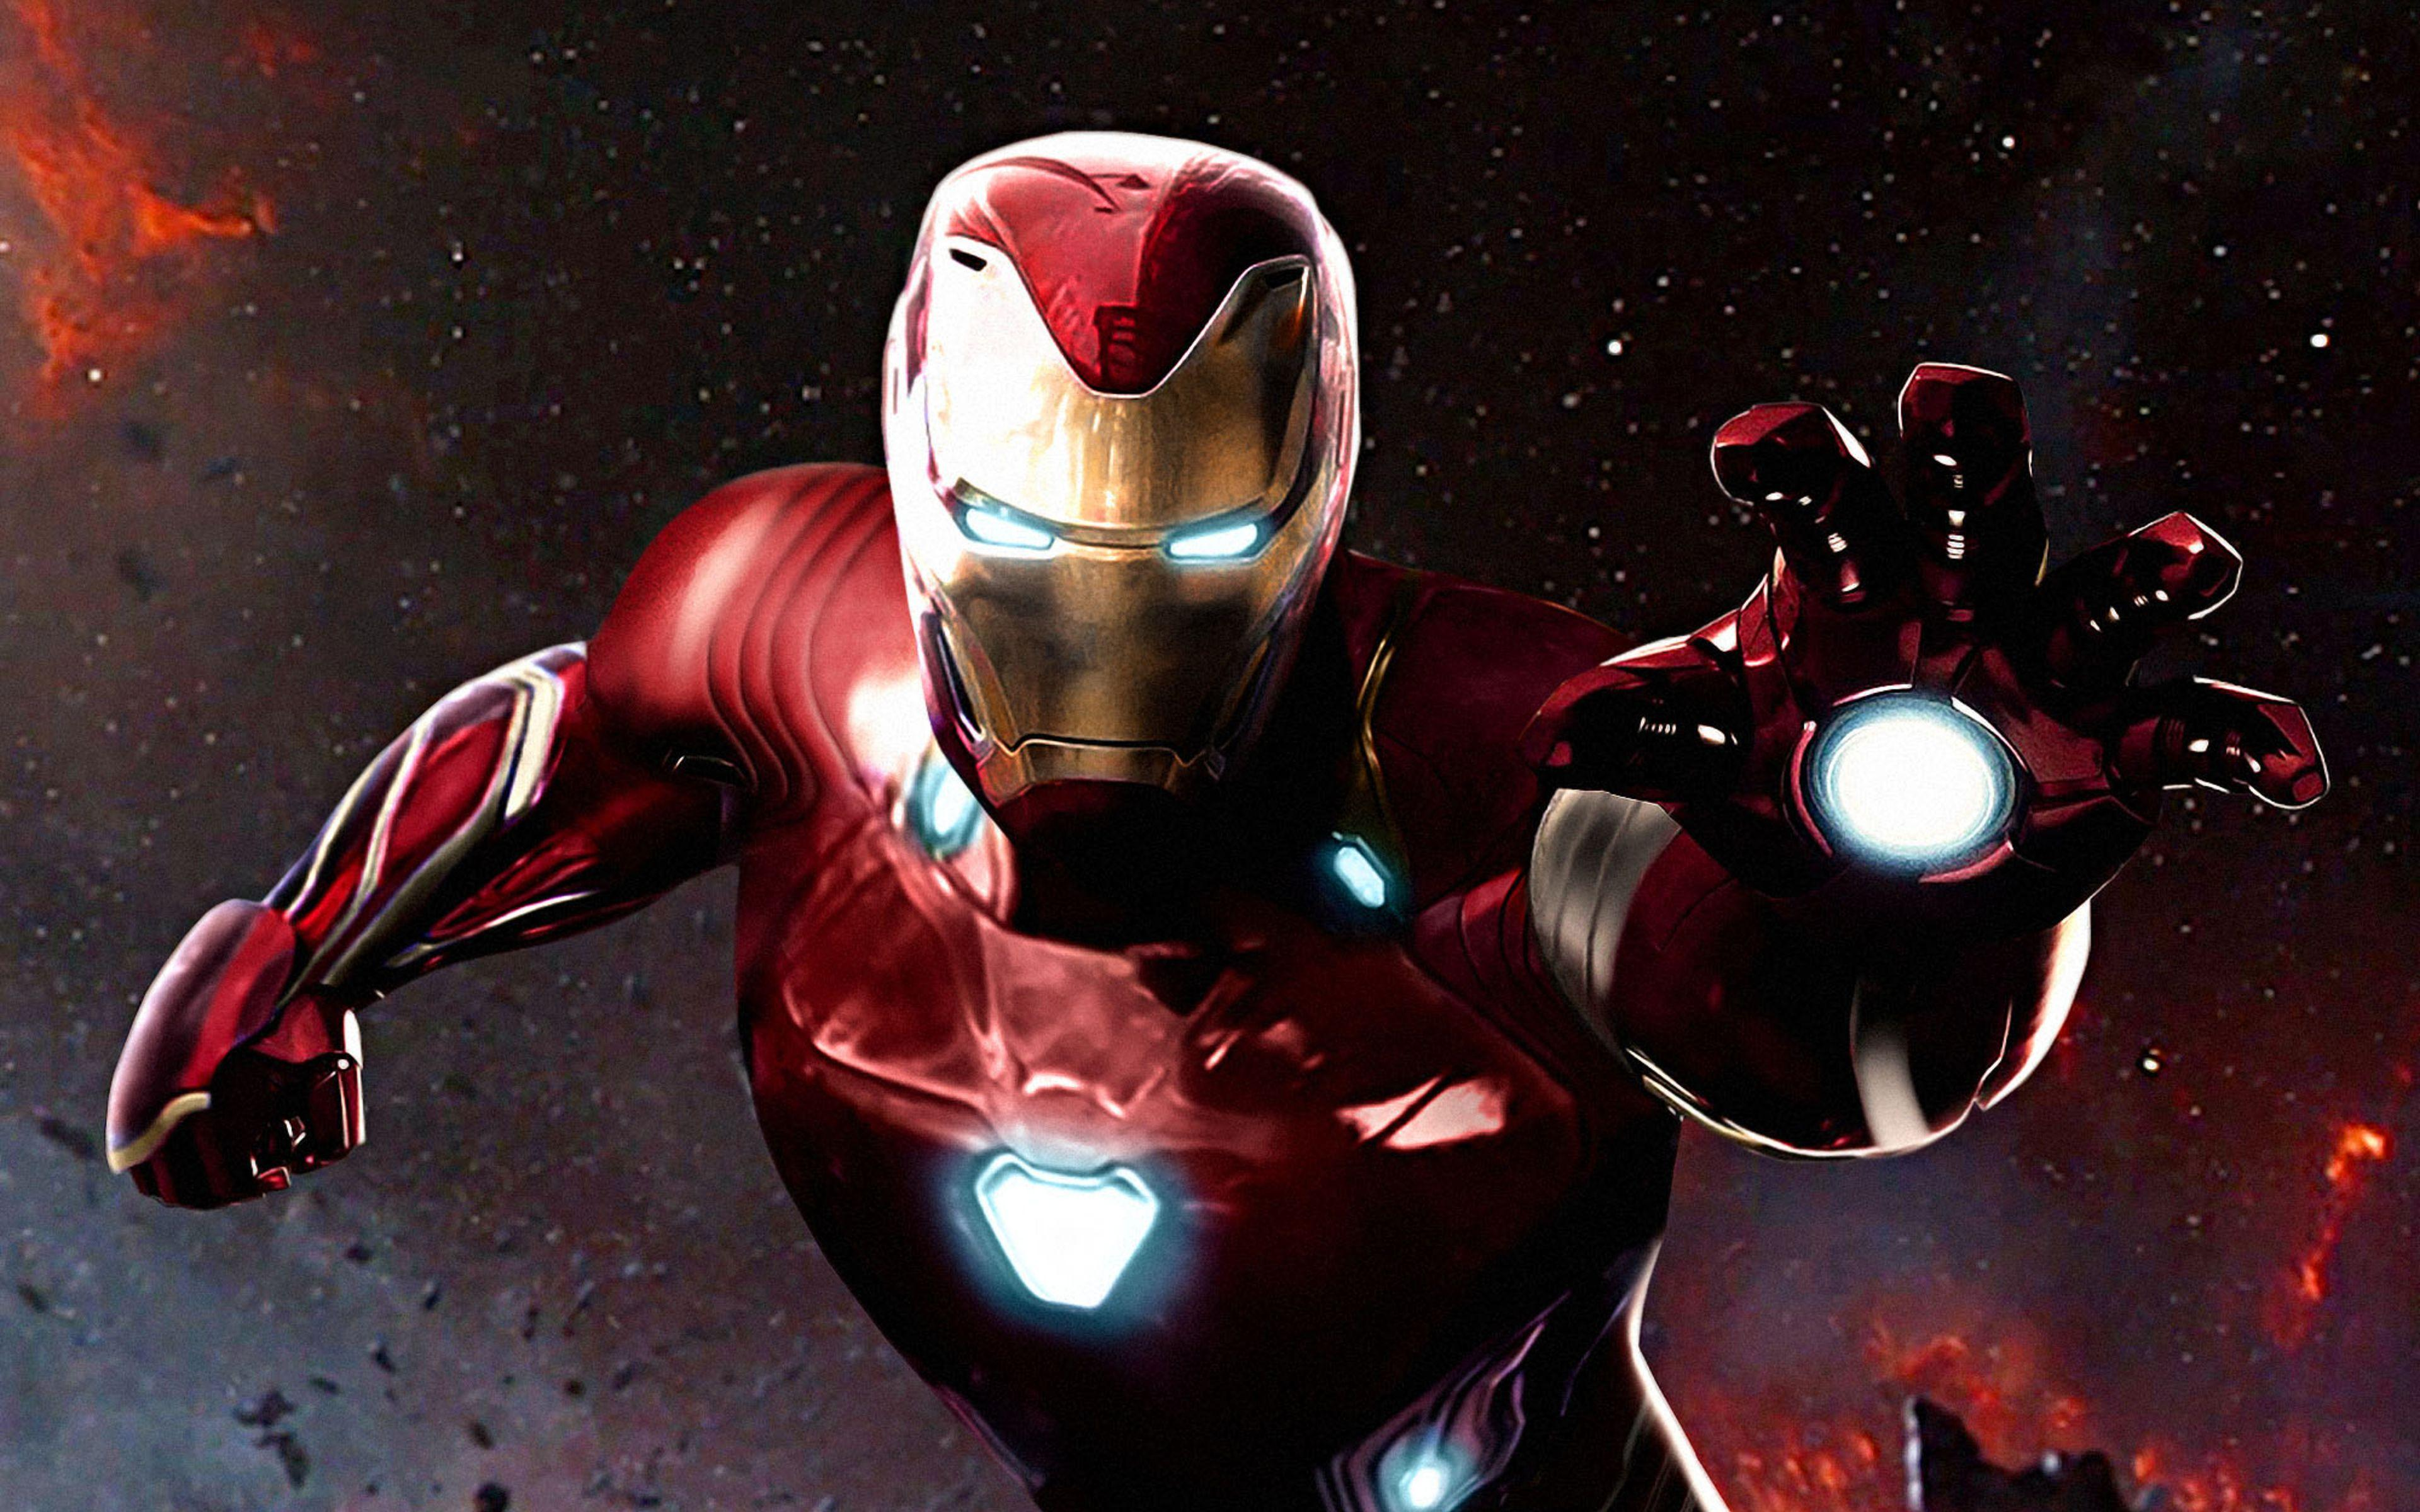 Iron Man Infinity War 4k Wallpapers Wallpaper Cave